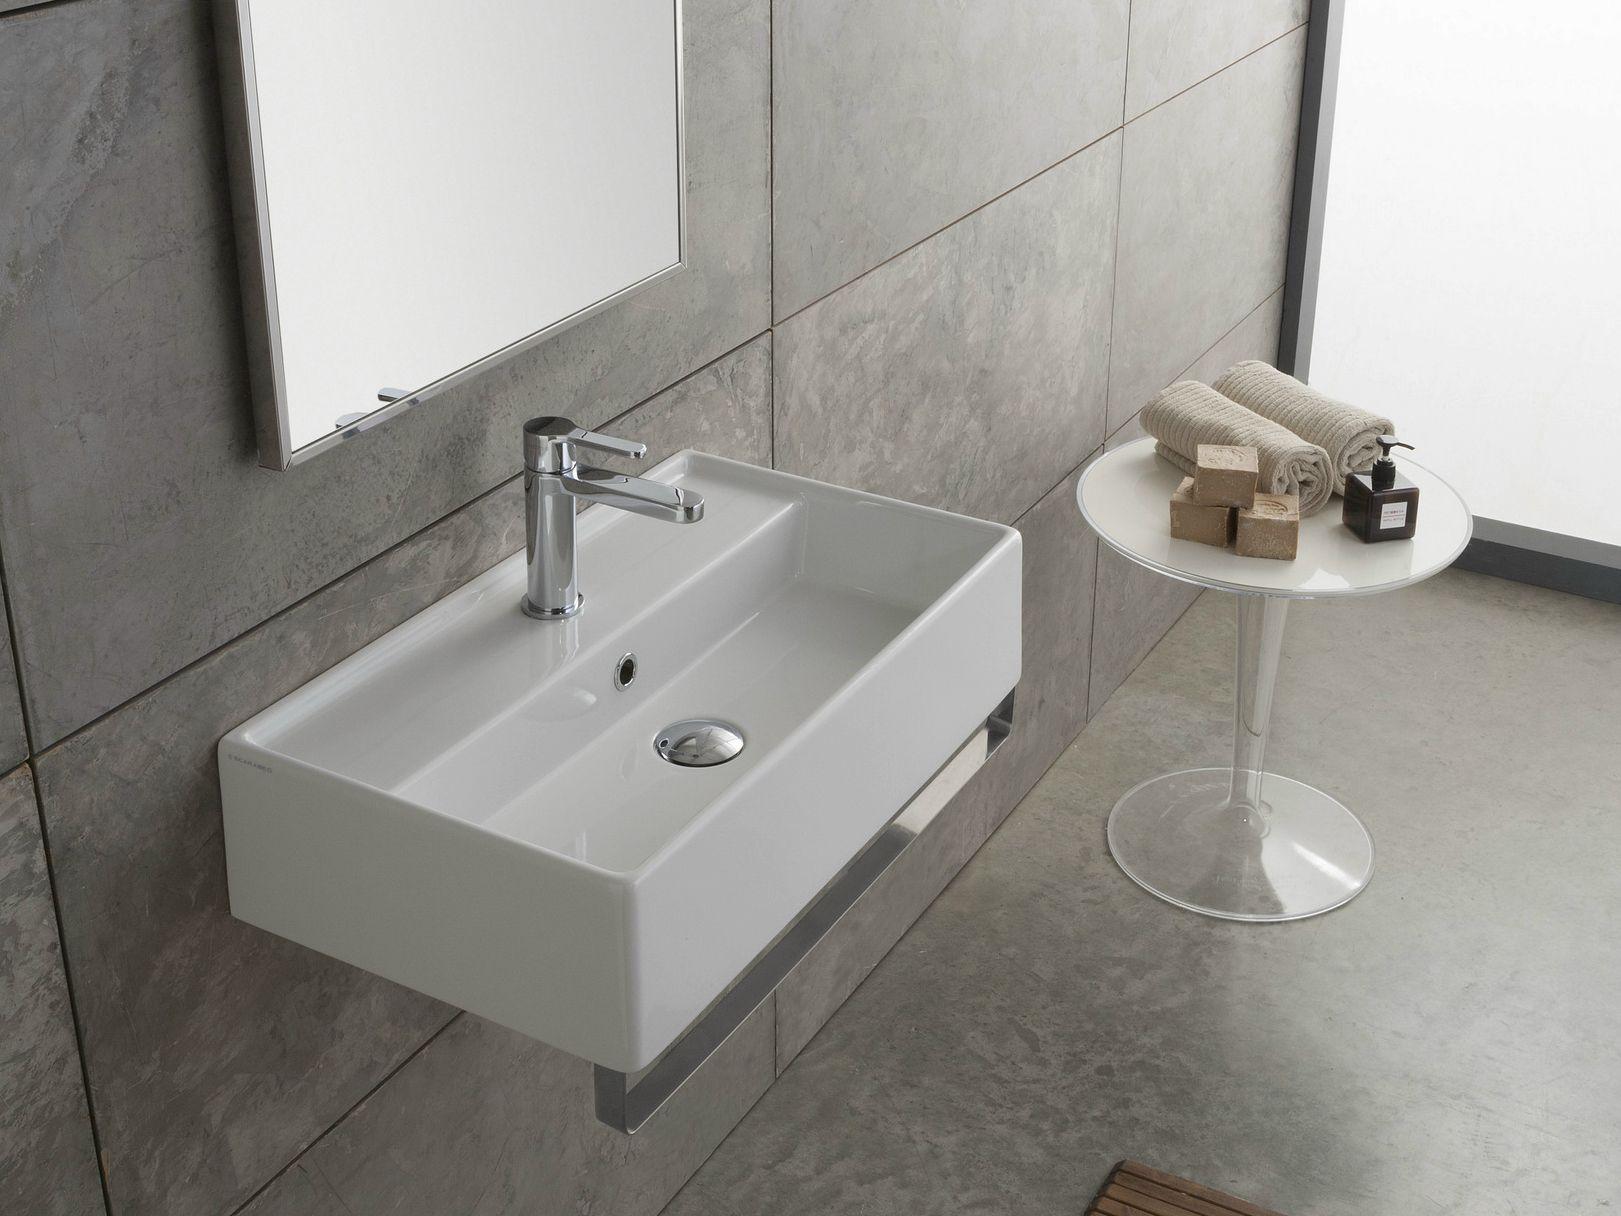 h nge waschbecken aus keramik teorema 60x35r by scarabeo. Black Bedroom Furniture Sets. Home Design Ideas